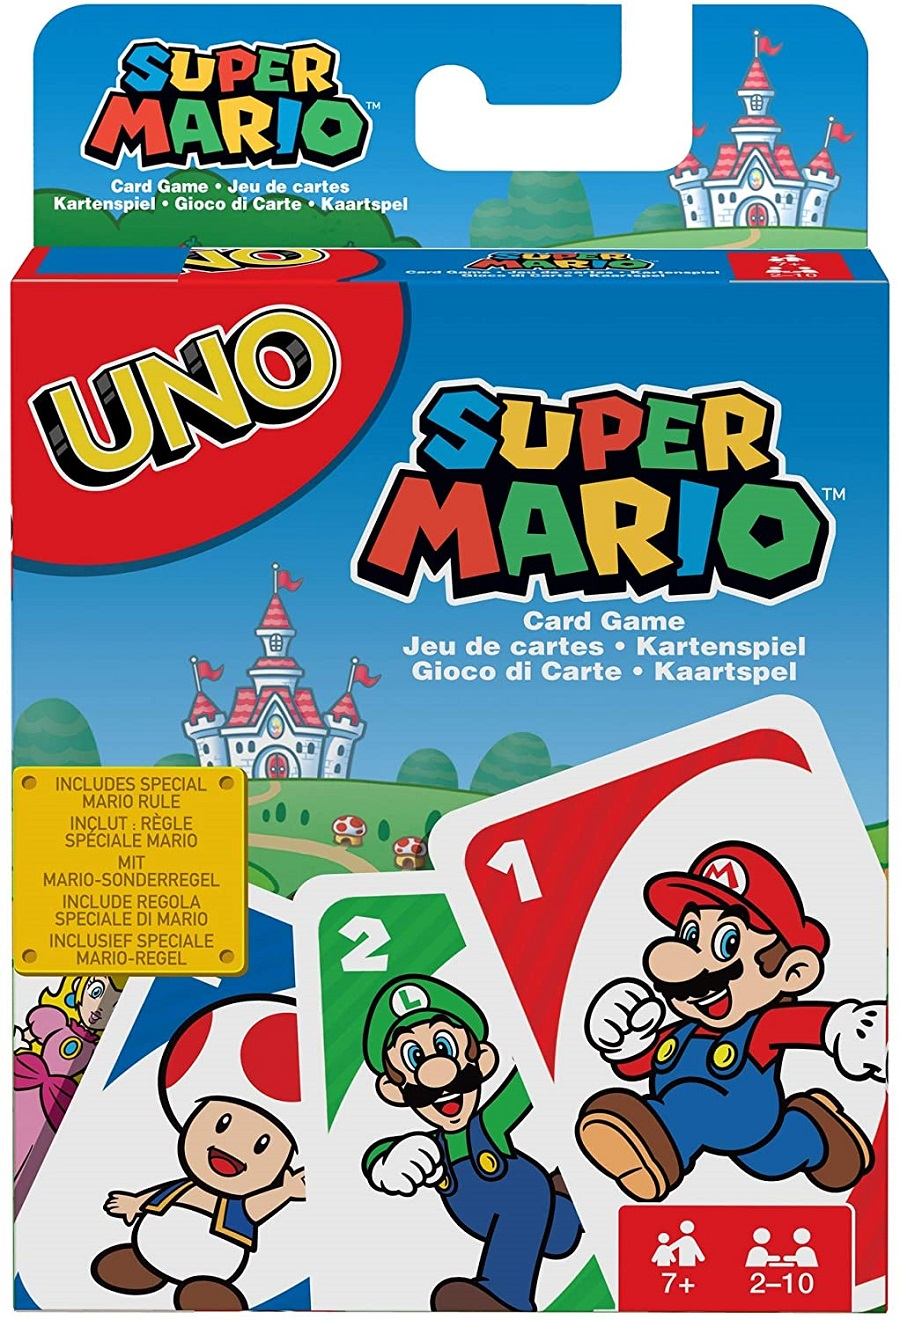 ONE Super Mario, You, Super Mario Bros and ONE!